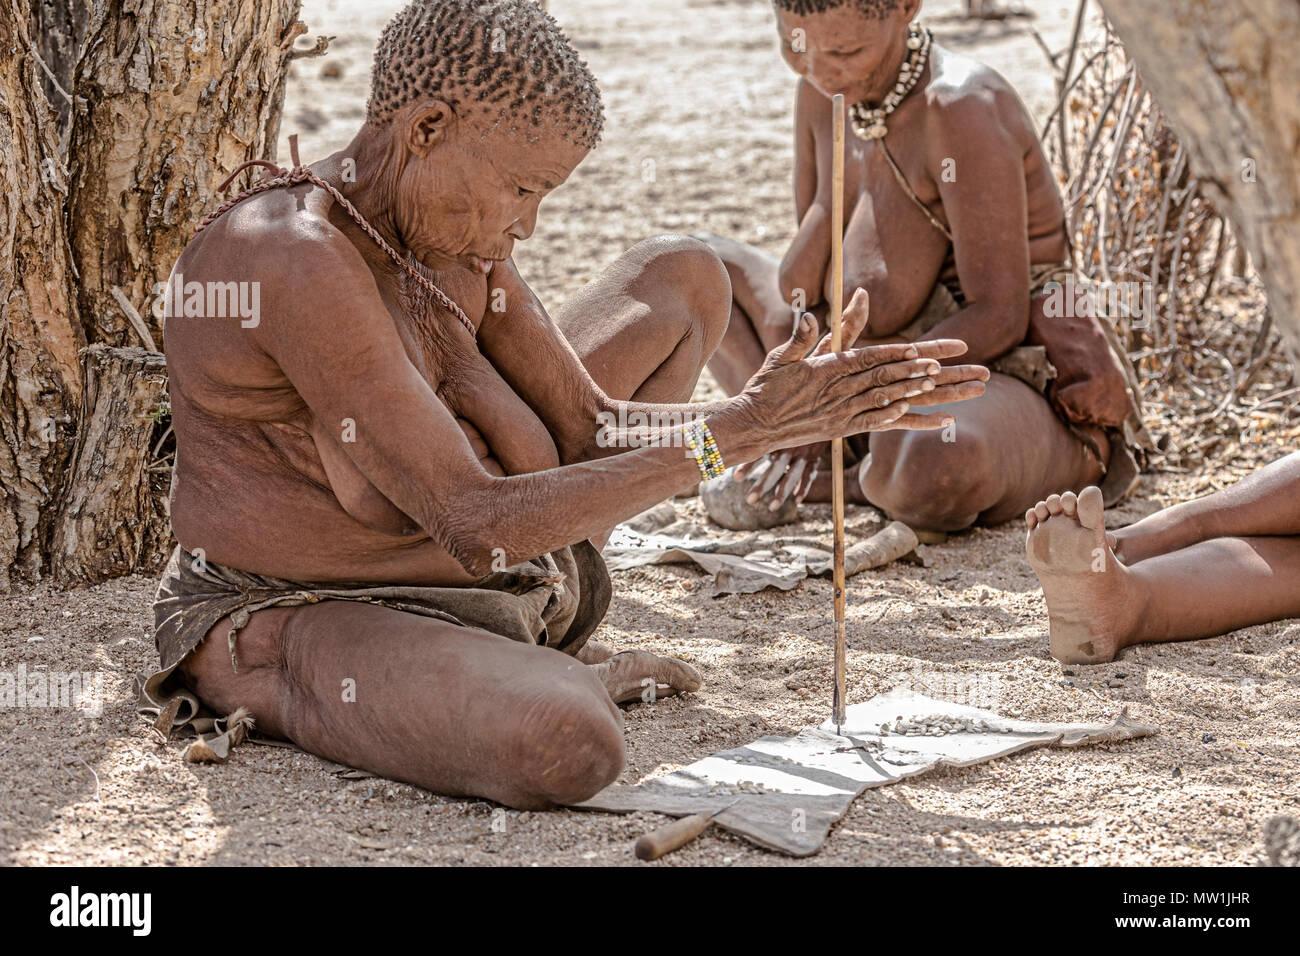 San, Living Museum, Omandumba, Damaraland, Namibia, Africa - Stock Image